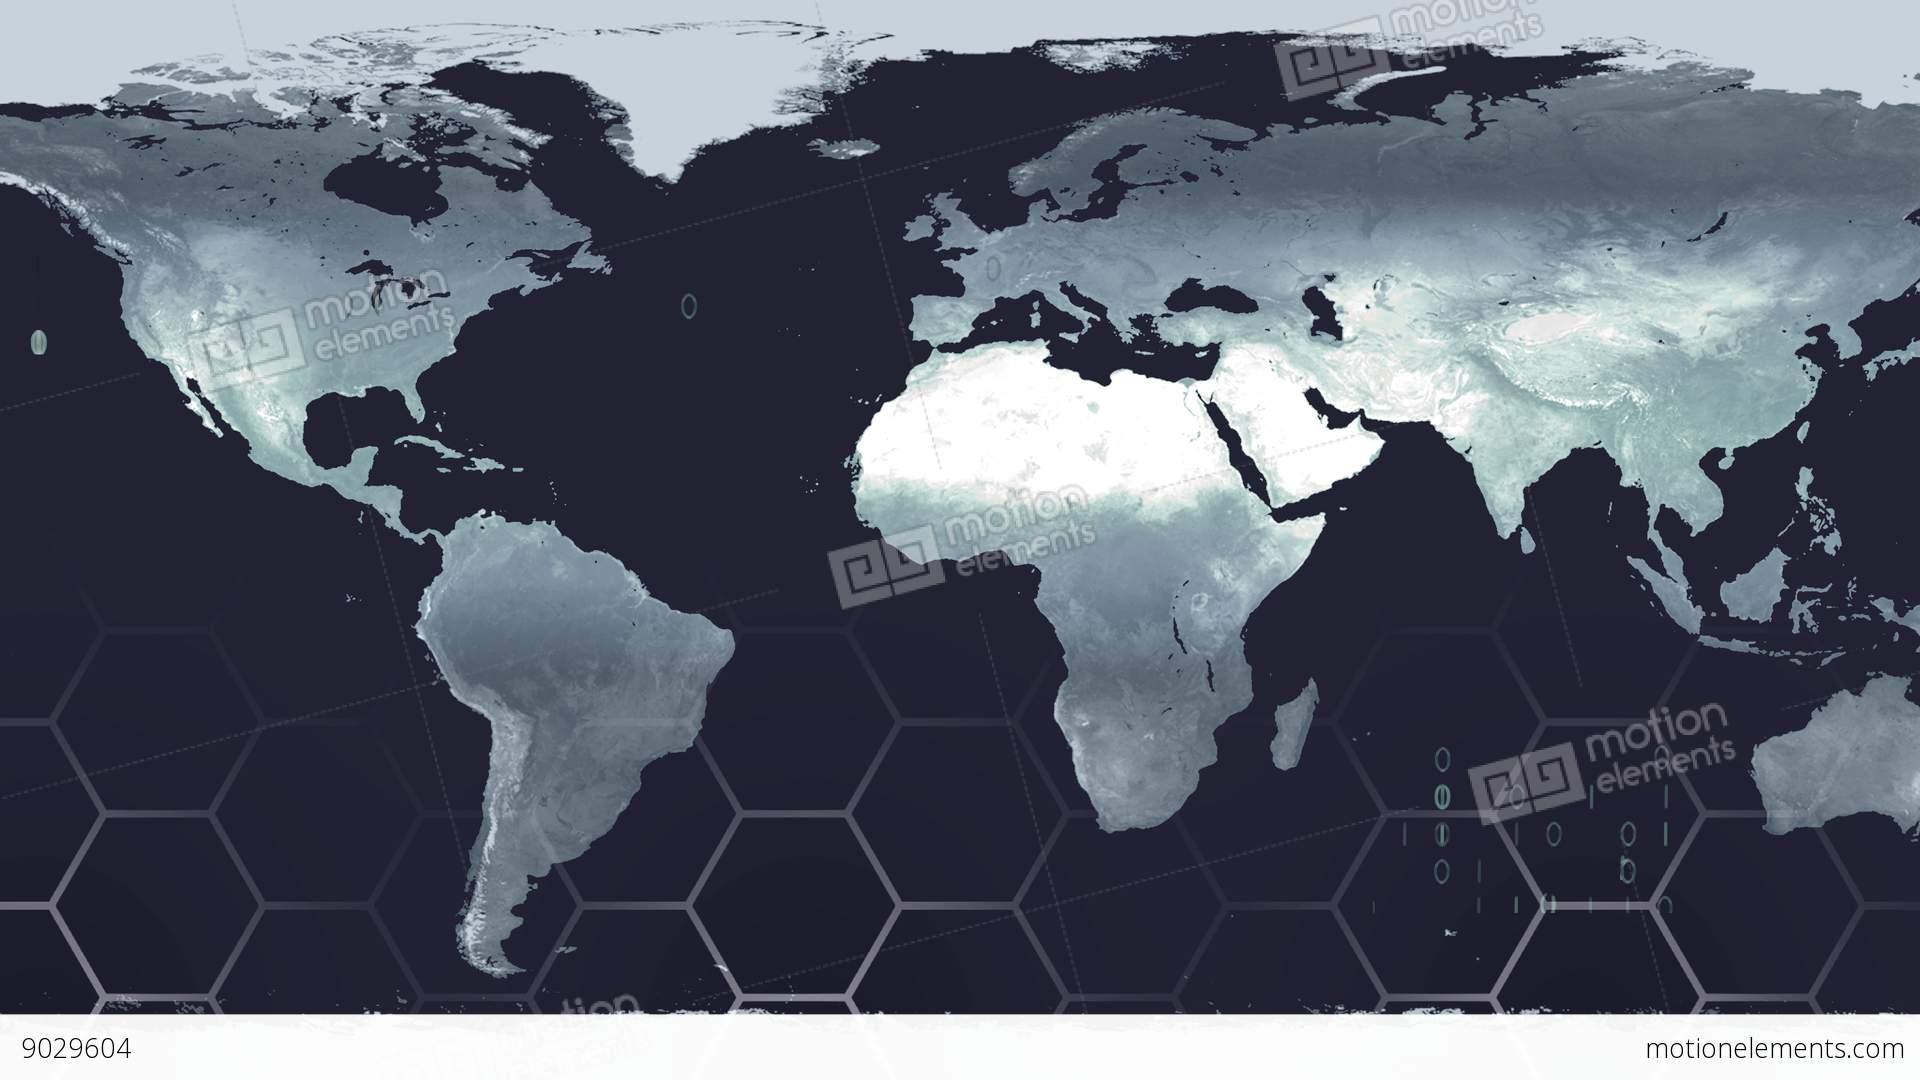 World map high tech digital satellite data view war room 4k stock world map high tech digital satellite data view war room 4k stock video footage gumiabroncs Choice Image